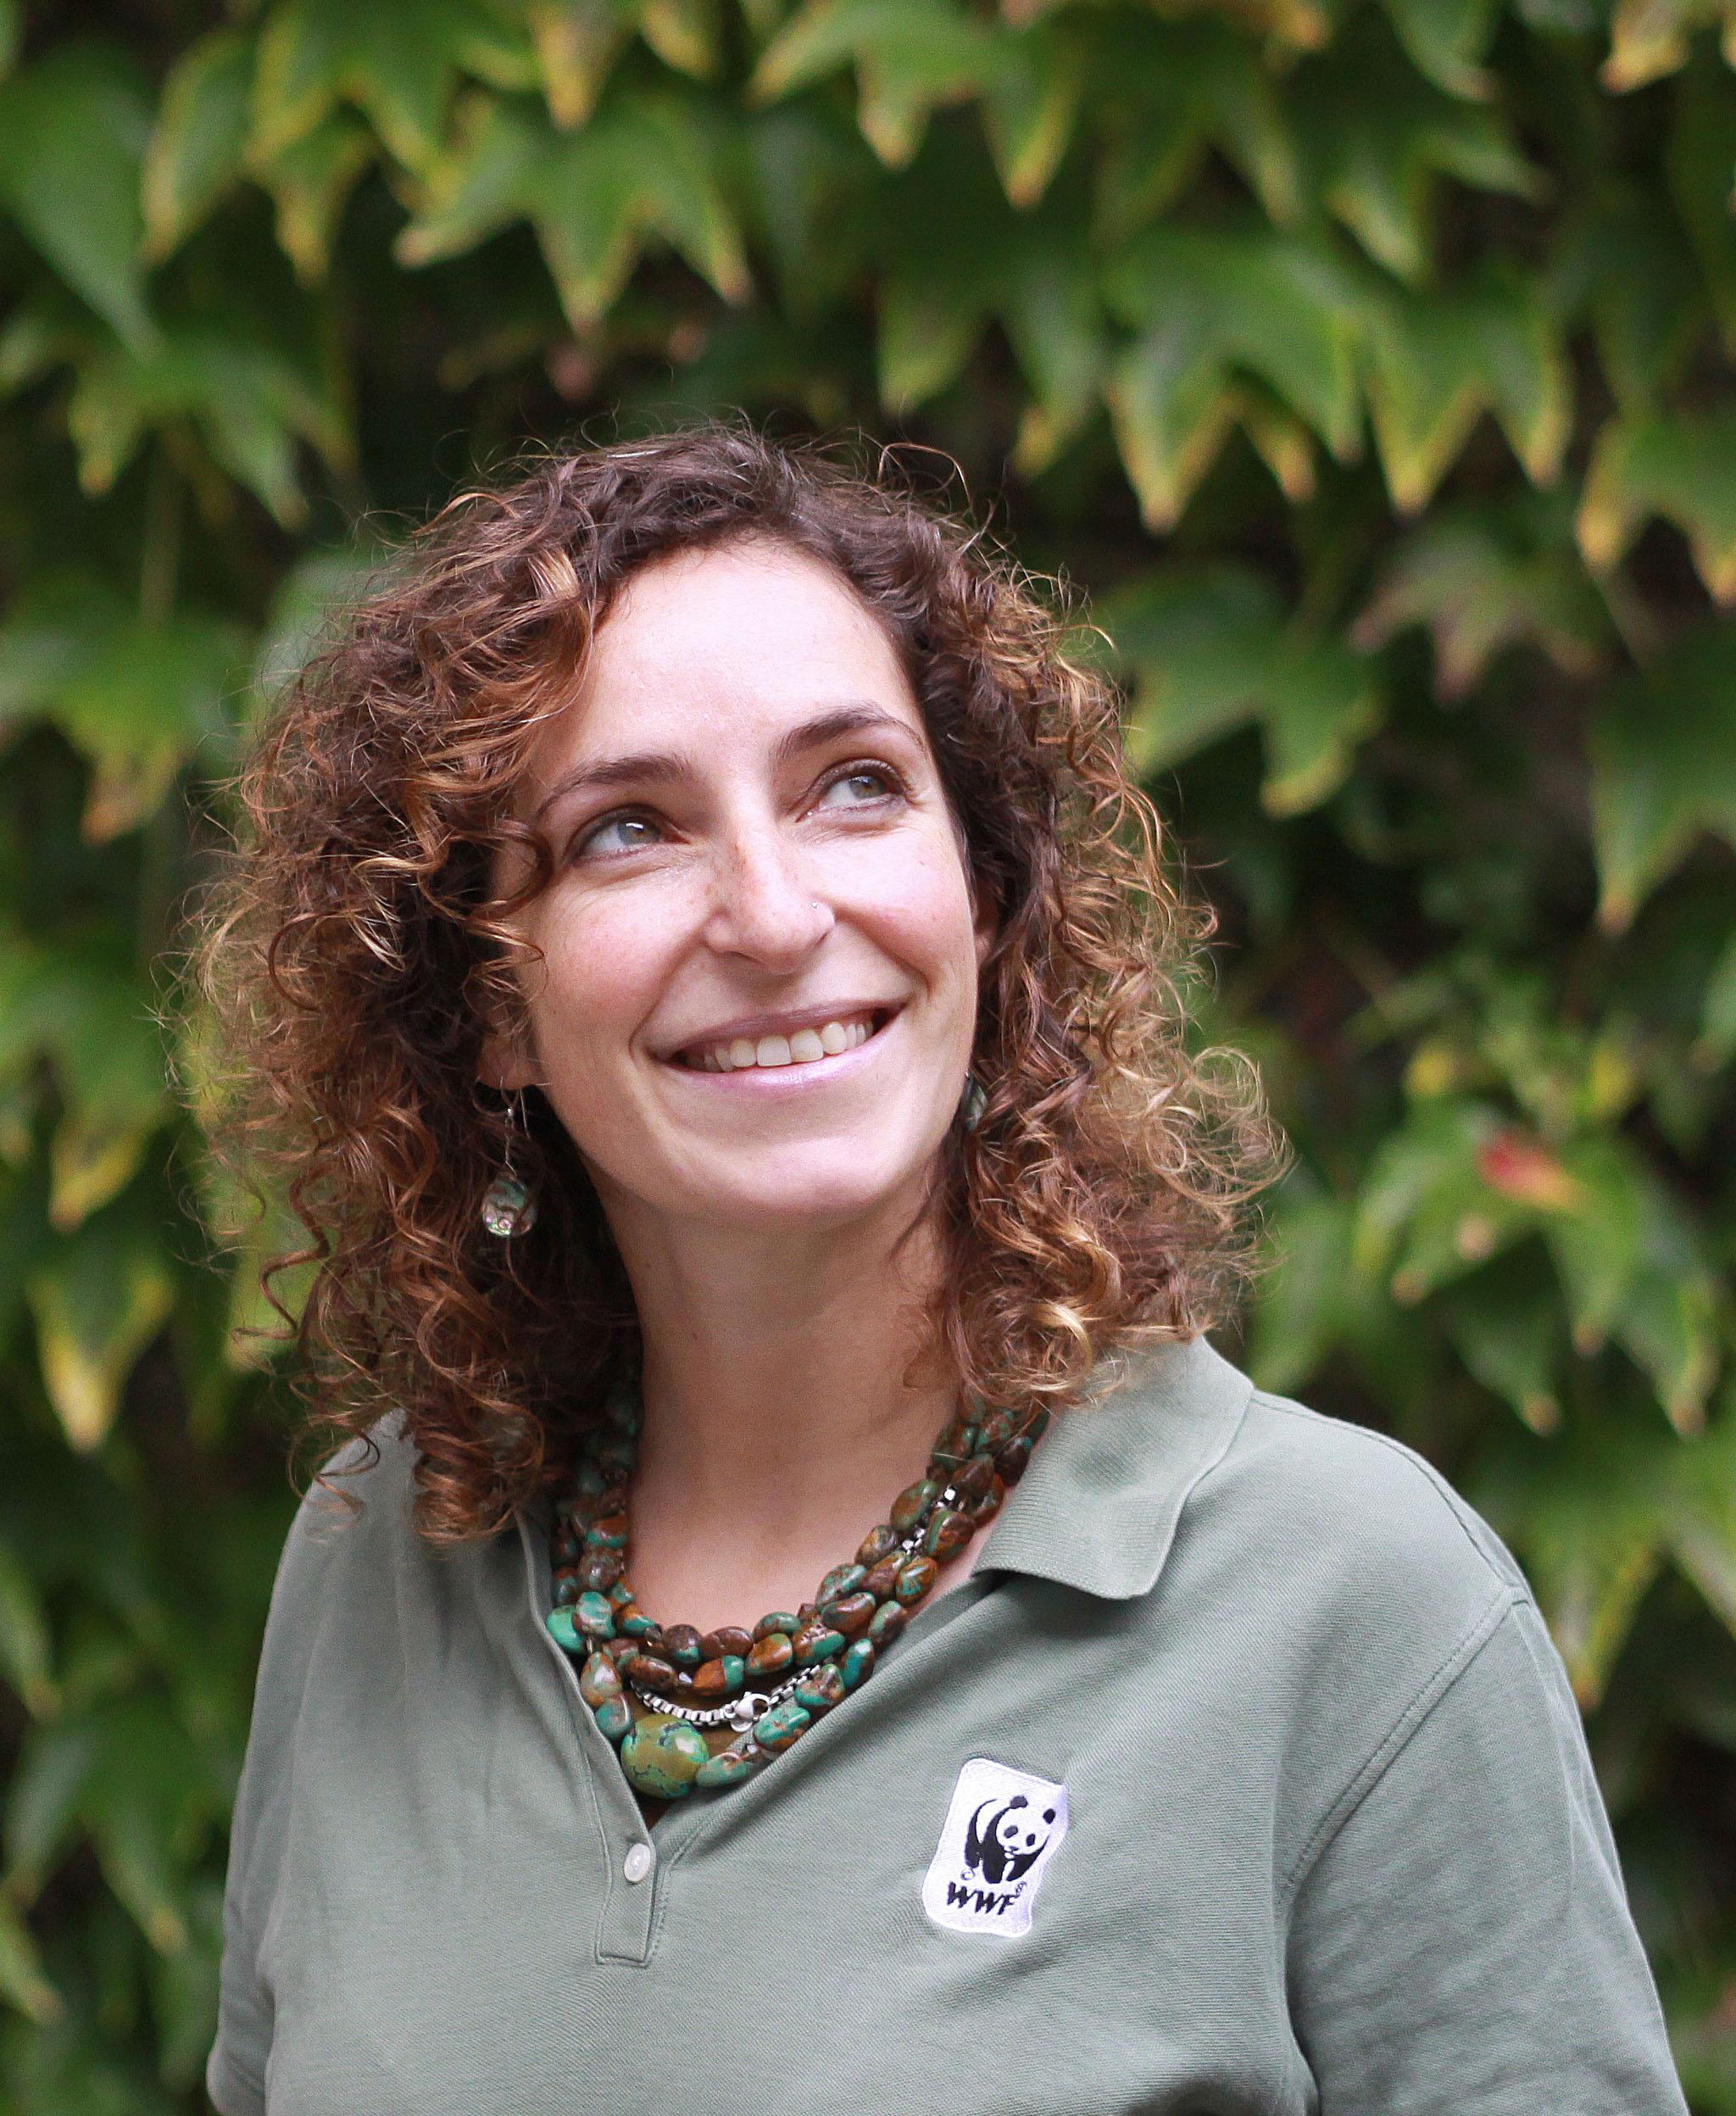 Aurélie Shapiro - Emotional Investor, WWF-Germany